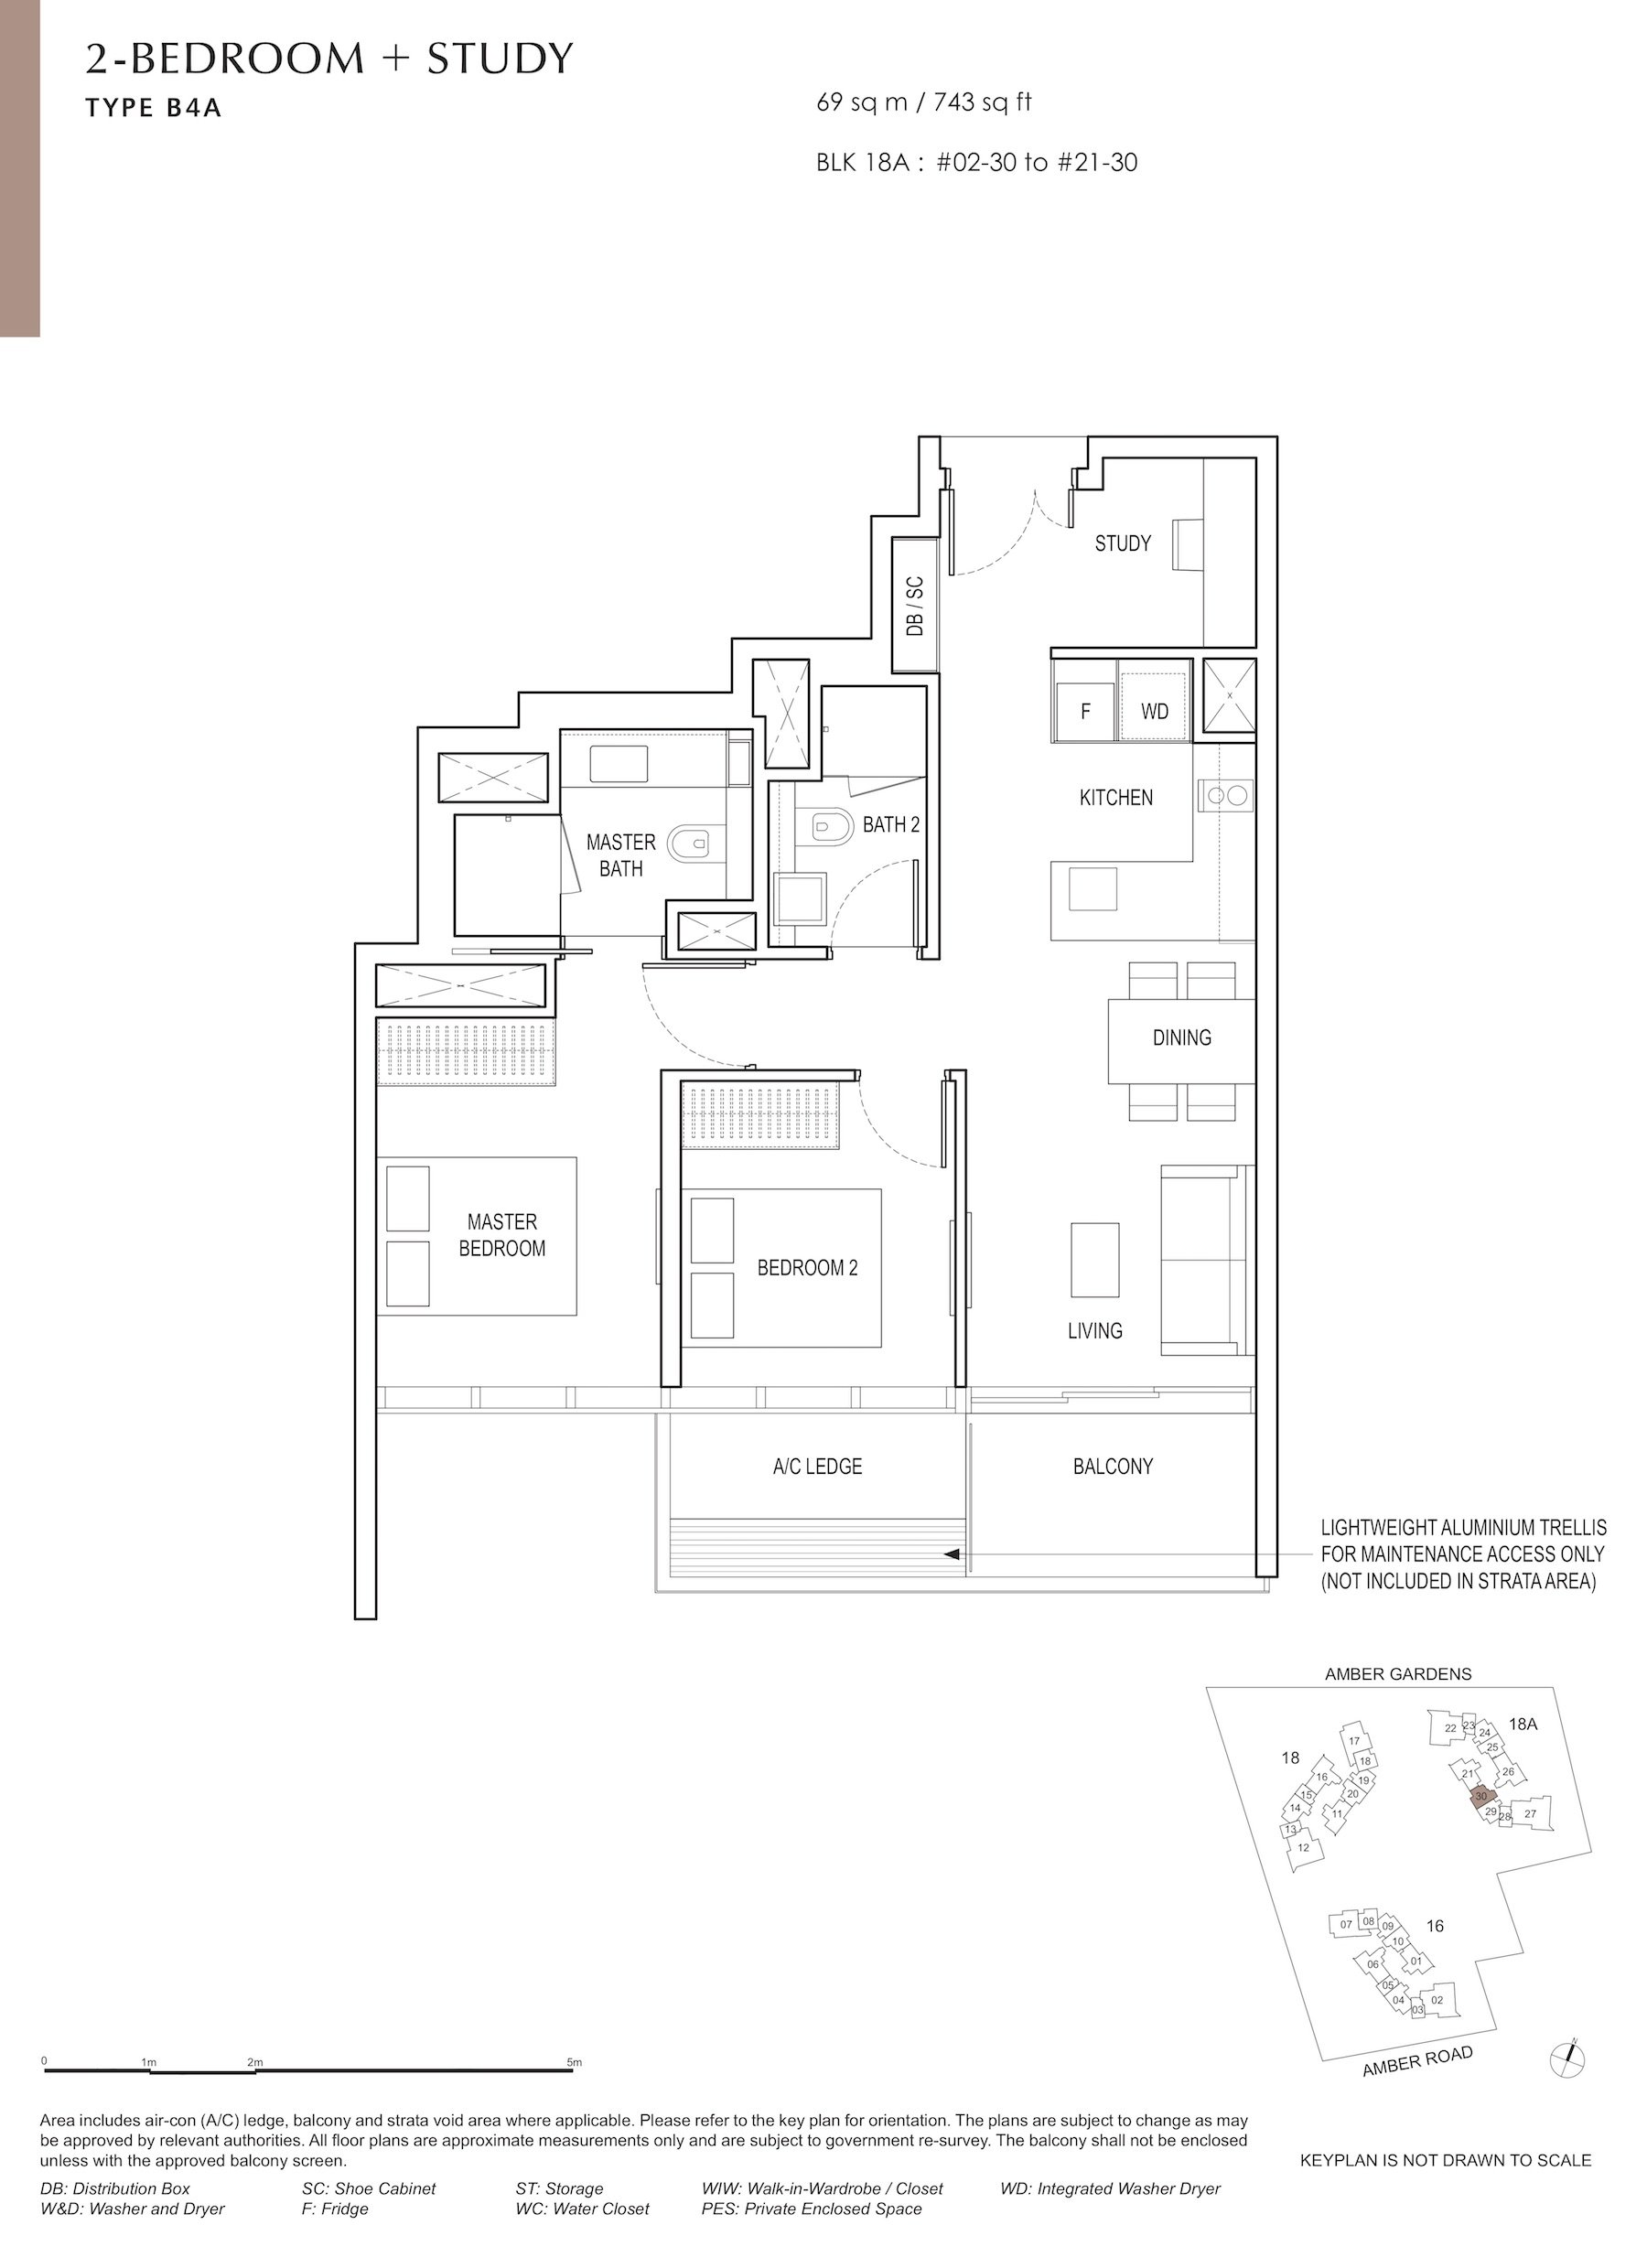 Amber Park 安铂苑 floor plan 2 bedroom + study 2卧房+书房 B4A